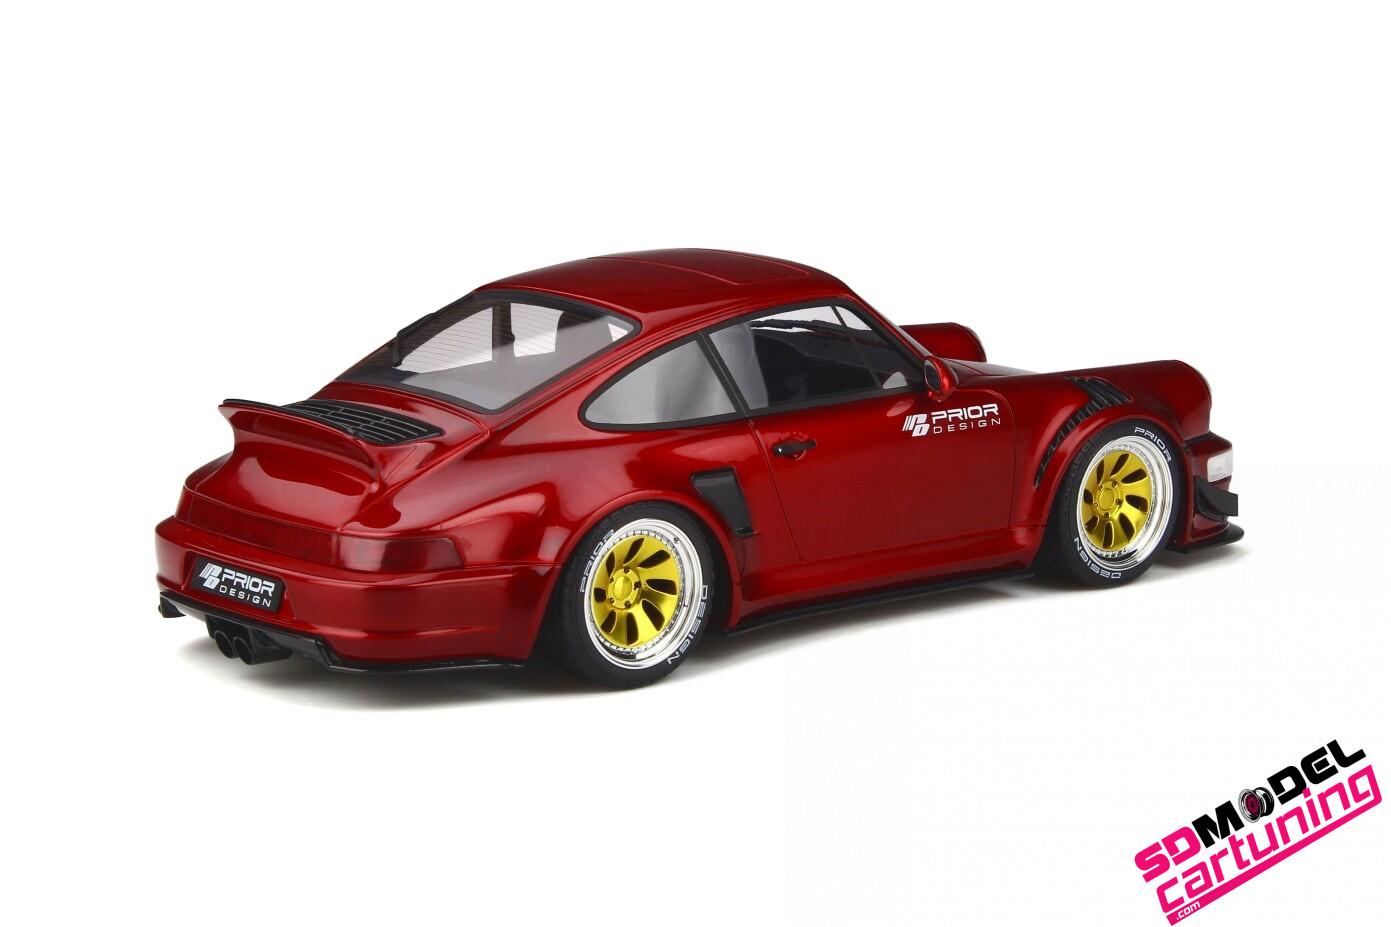 1:18 Porsche 964 Turbo Prior design